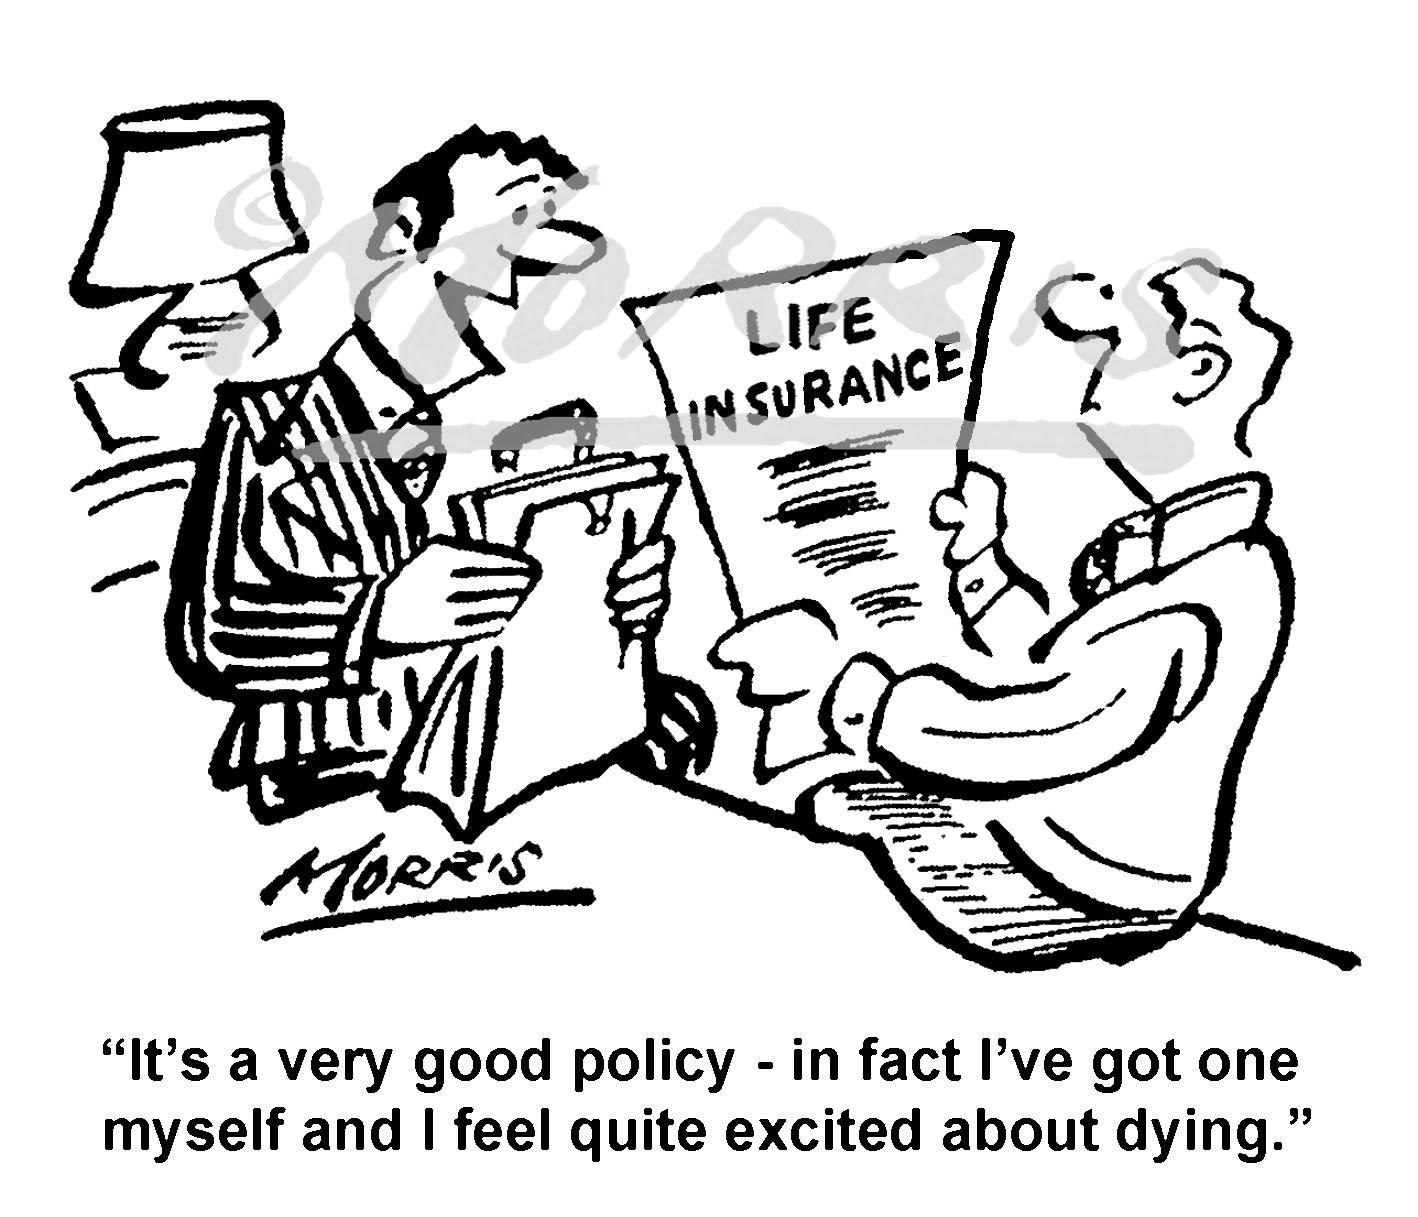 Life insurance cartoon Ref: 8573bw